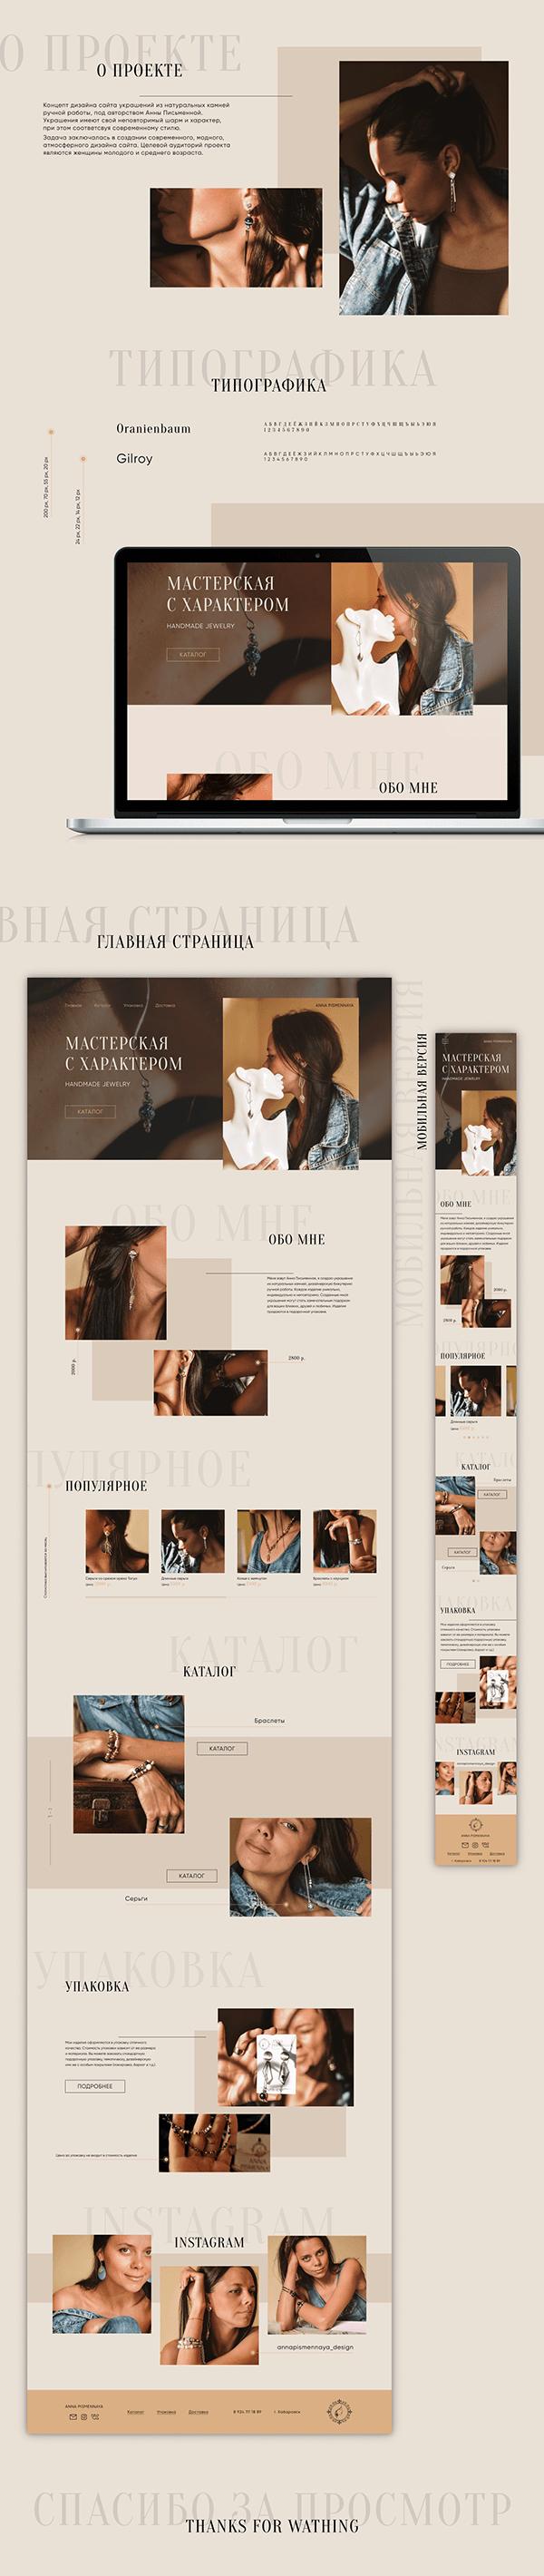 HandMade Jewerly | Design concept